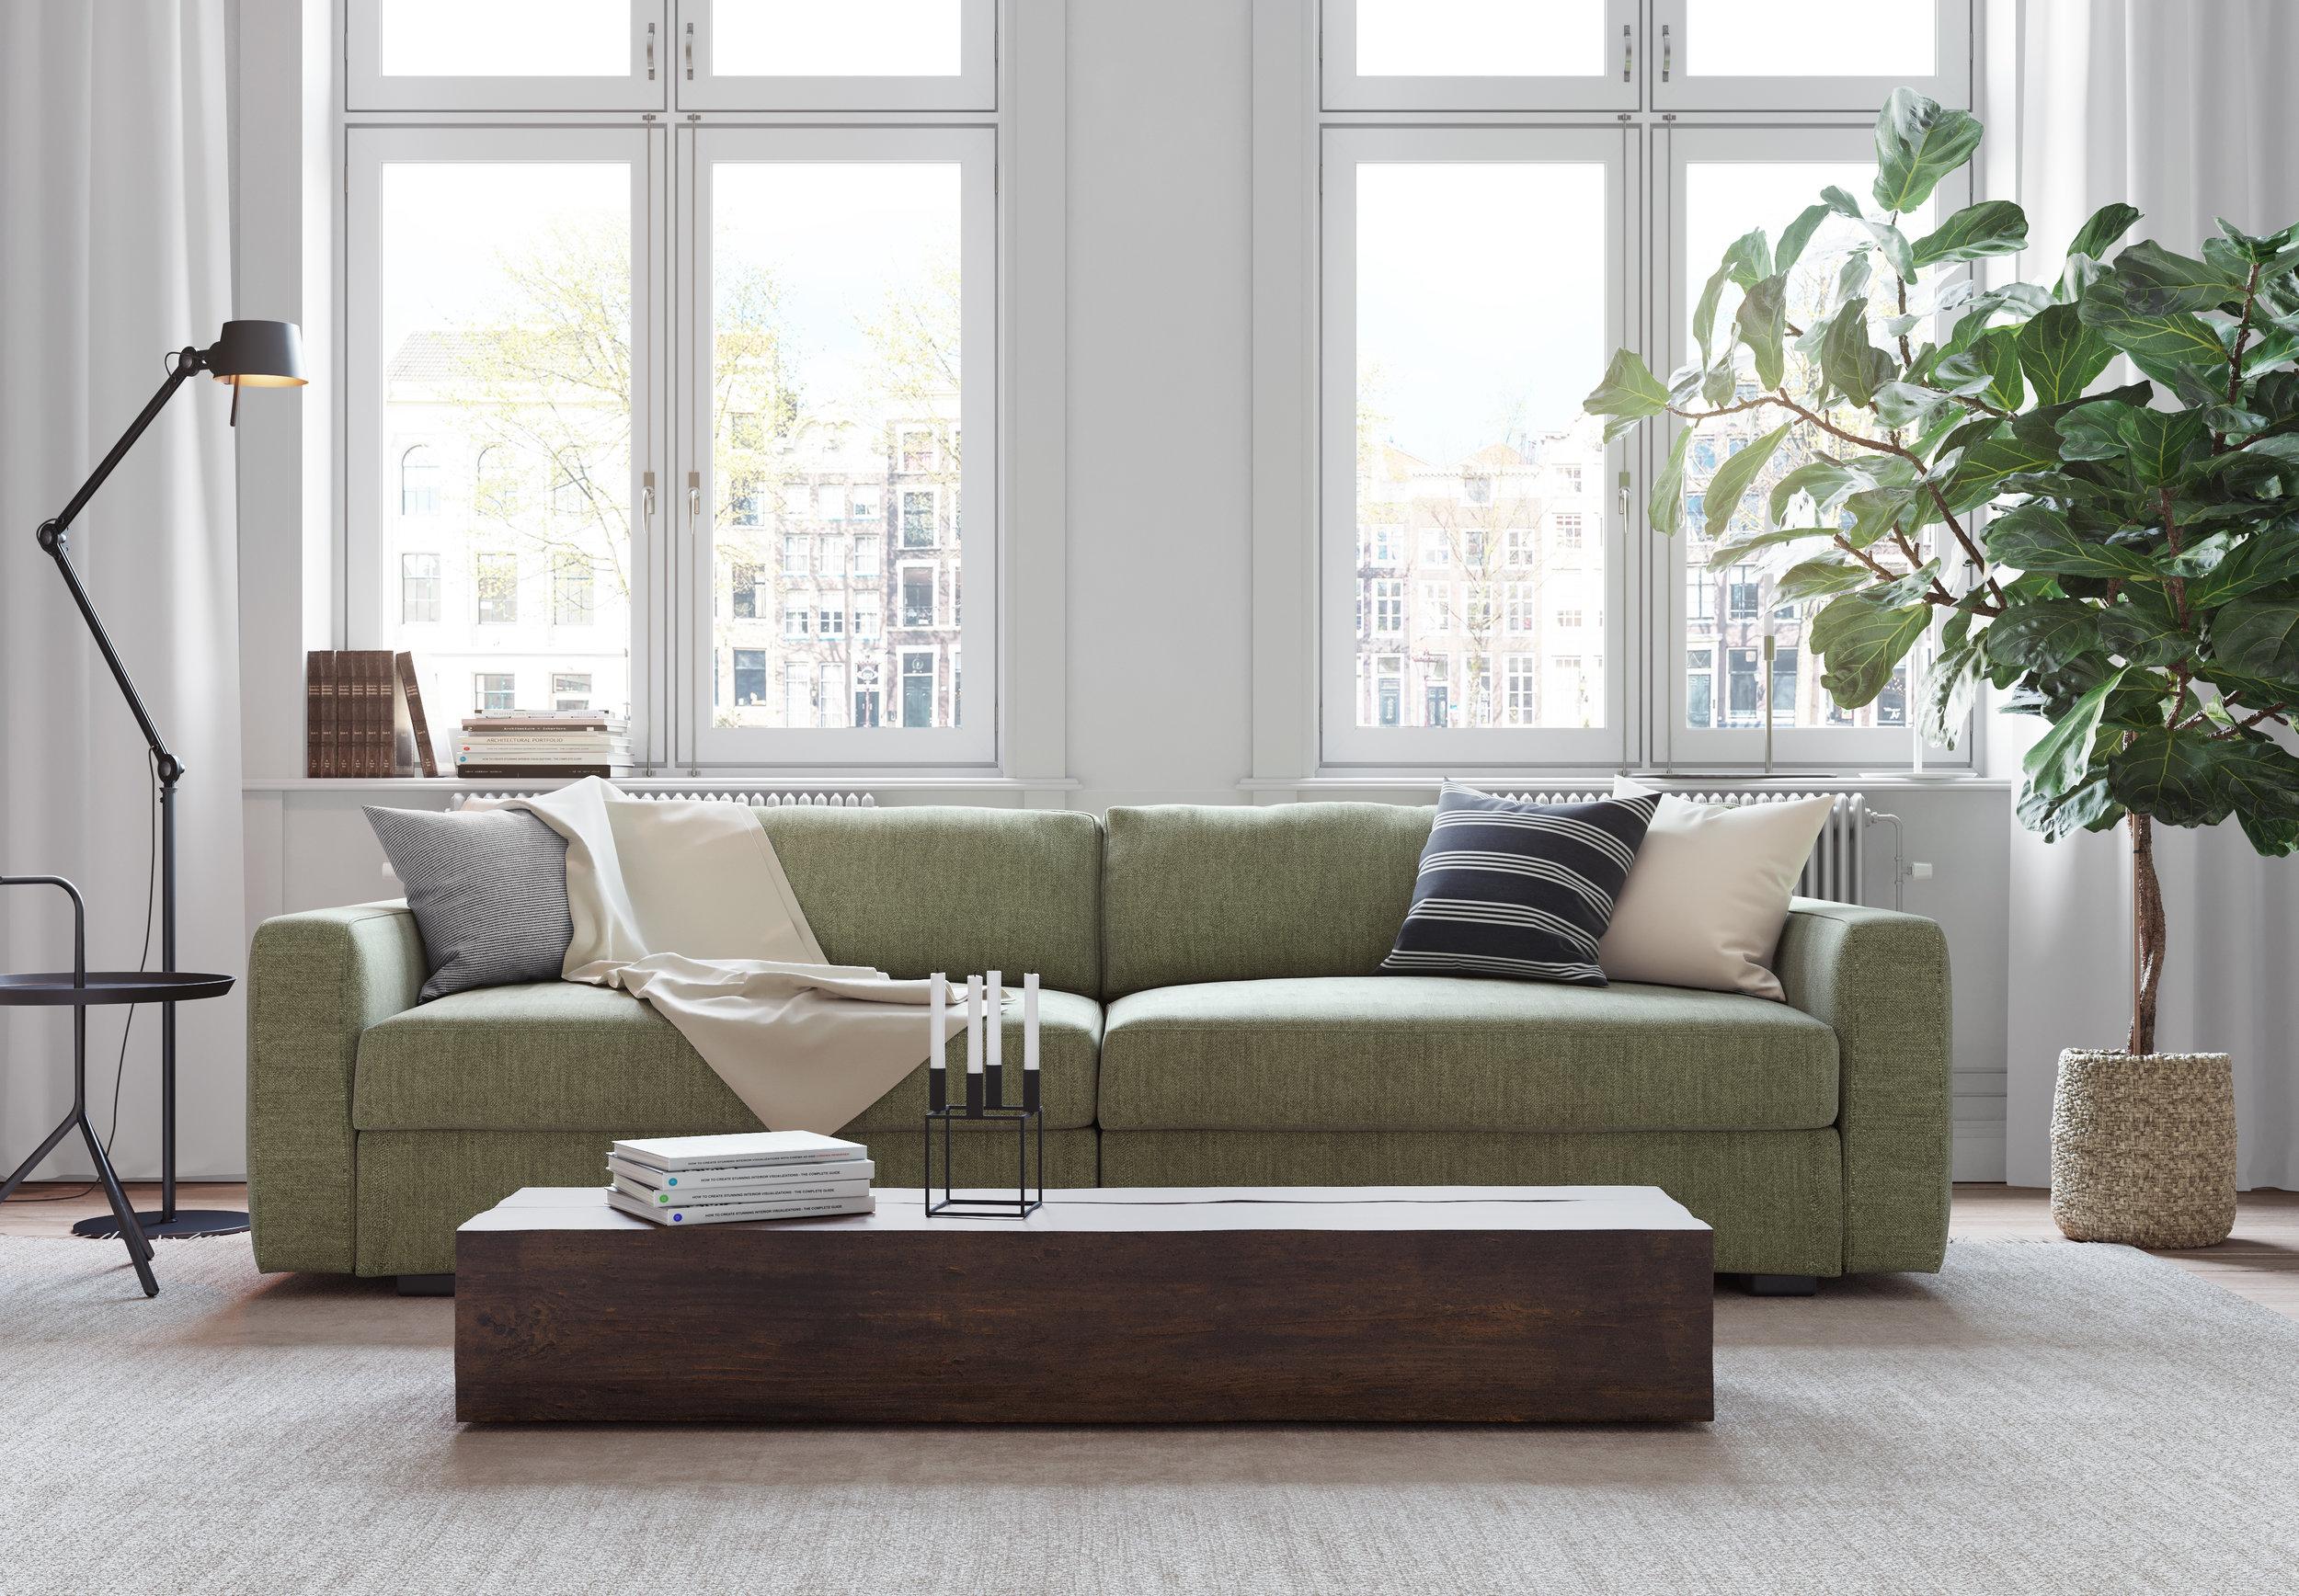 Sofa-Noorden-Amsterdam2.jpg